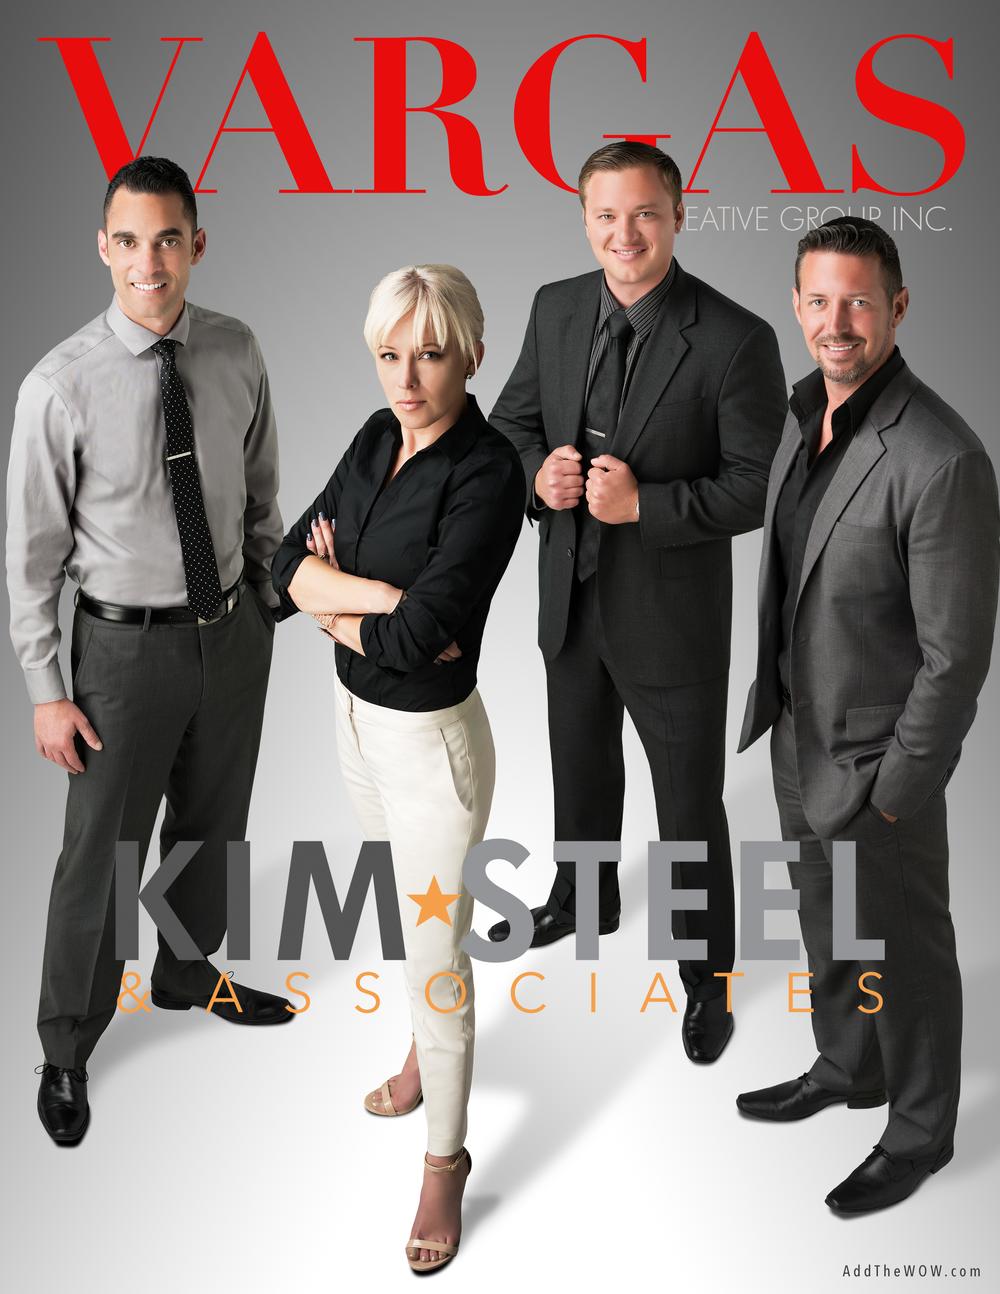 Kim Steel and Associates